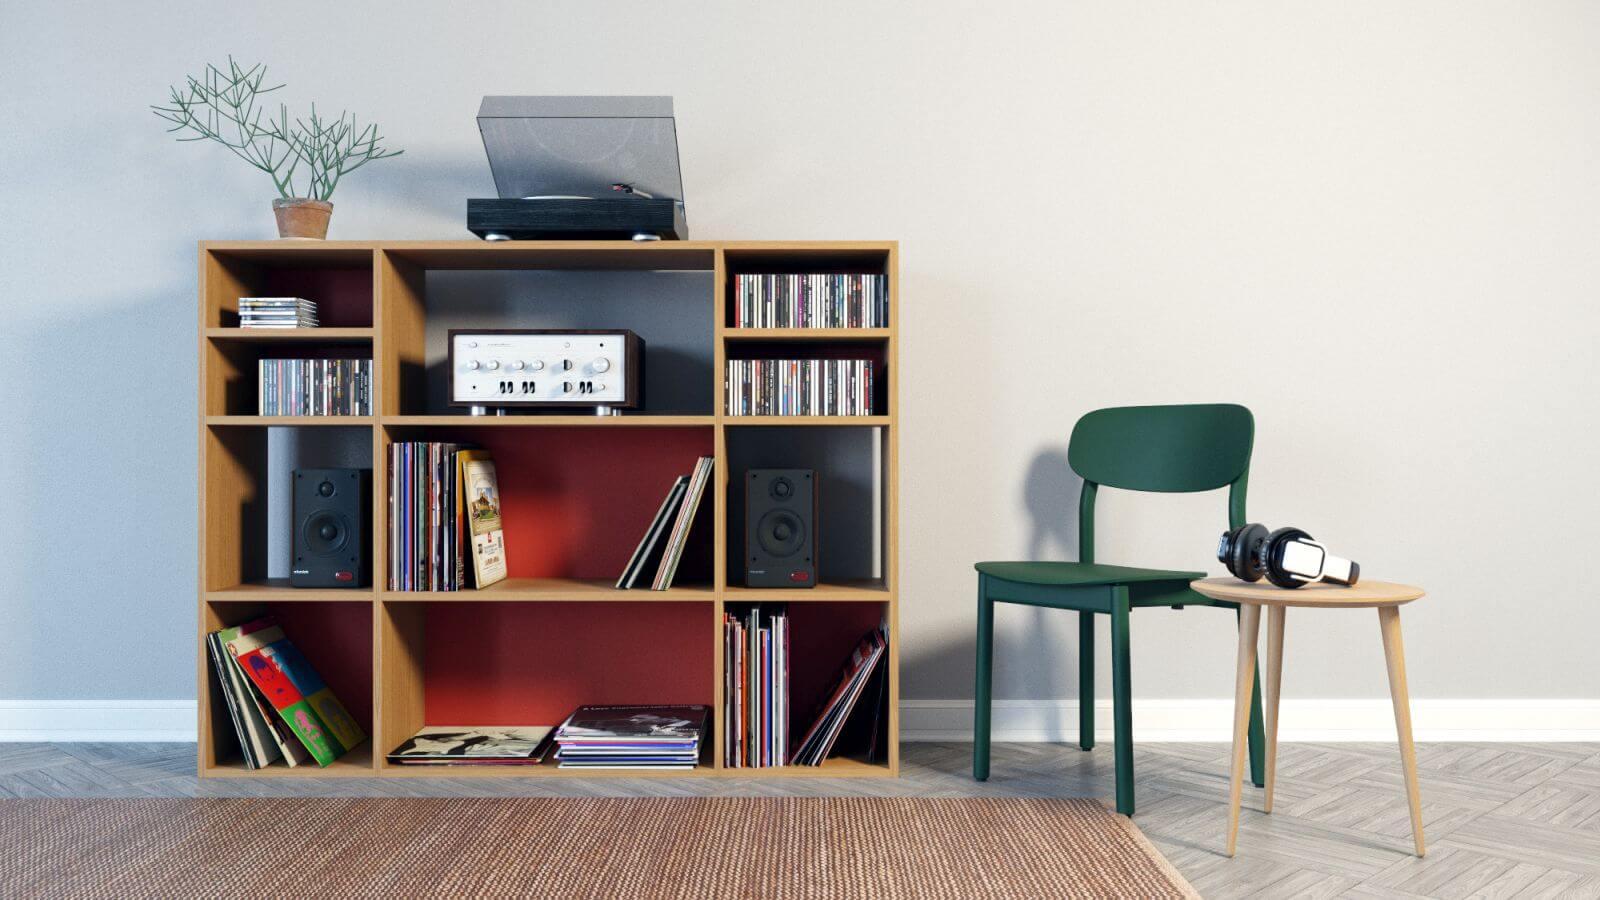 schallplattenregal online gestalten regale bei mycs. Black Bedroom Furniture Sets. Home Design Ideas